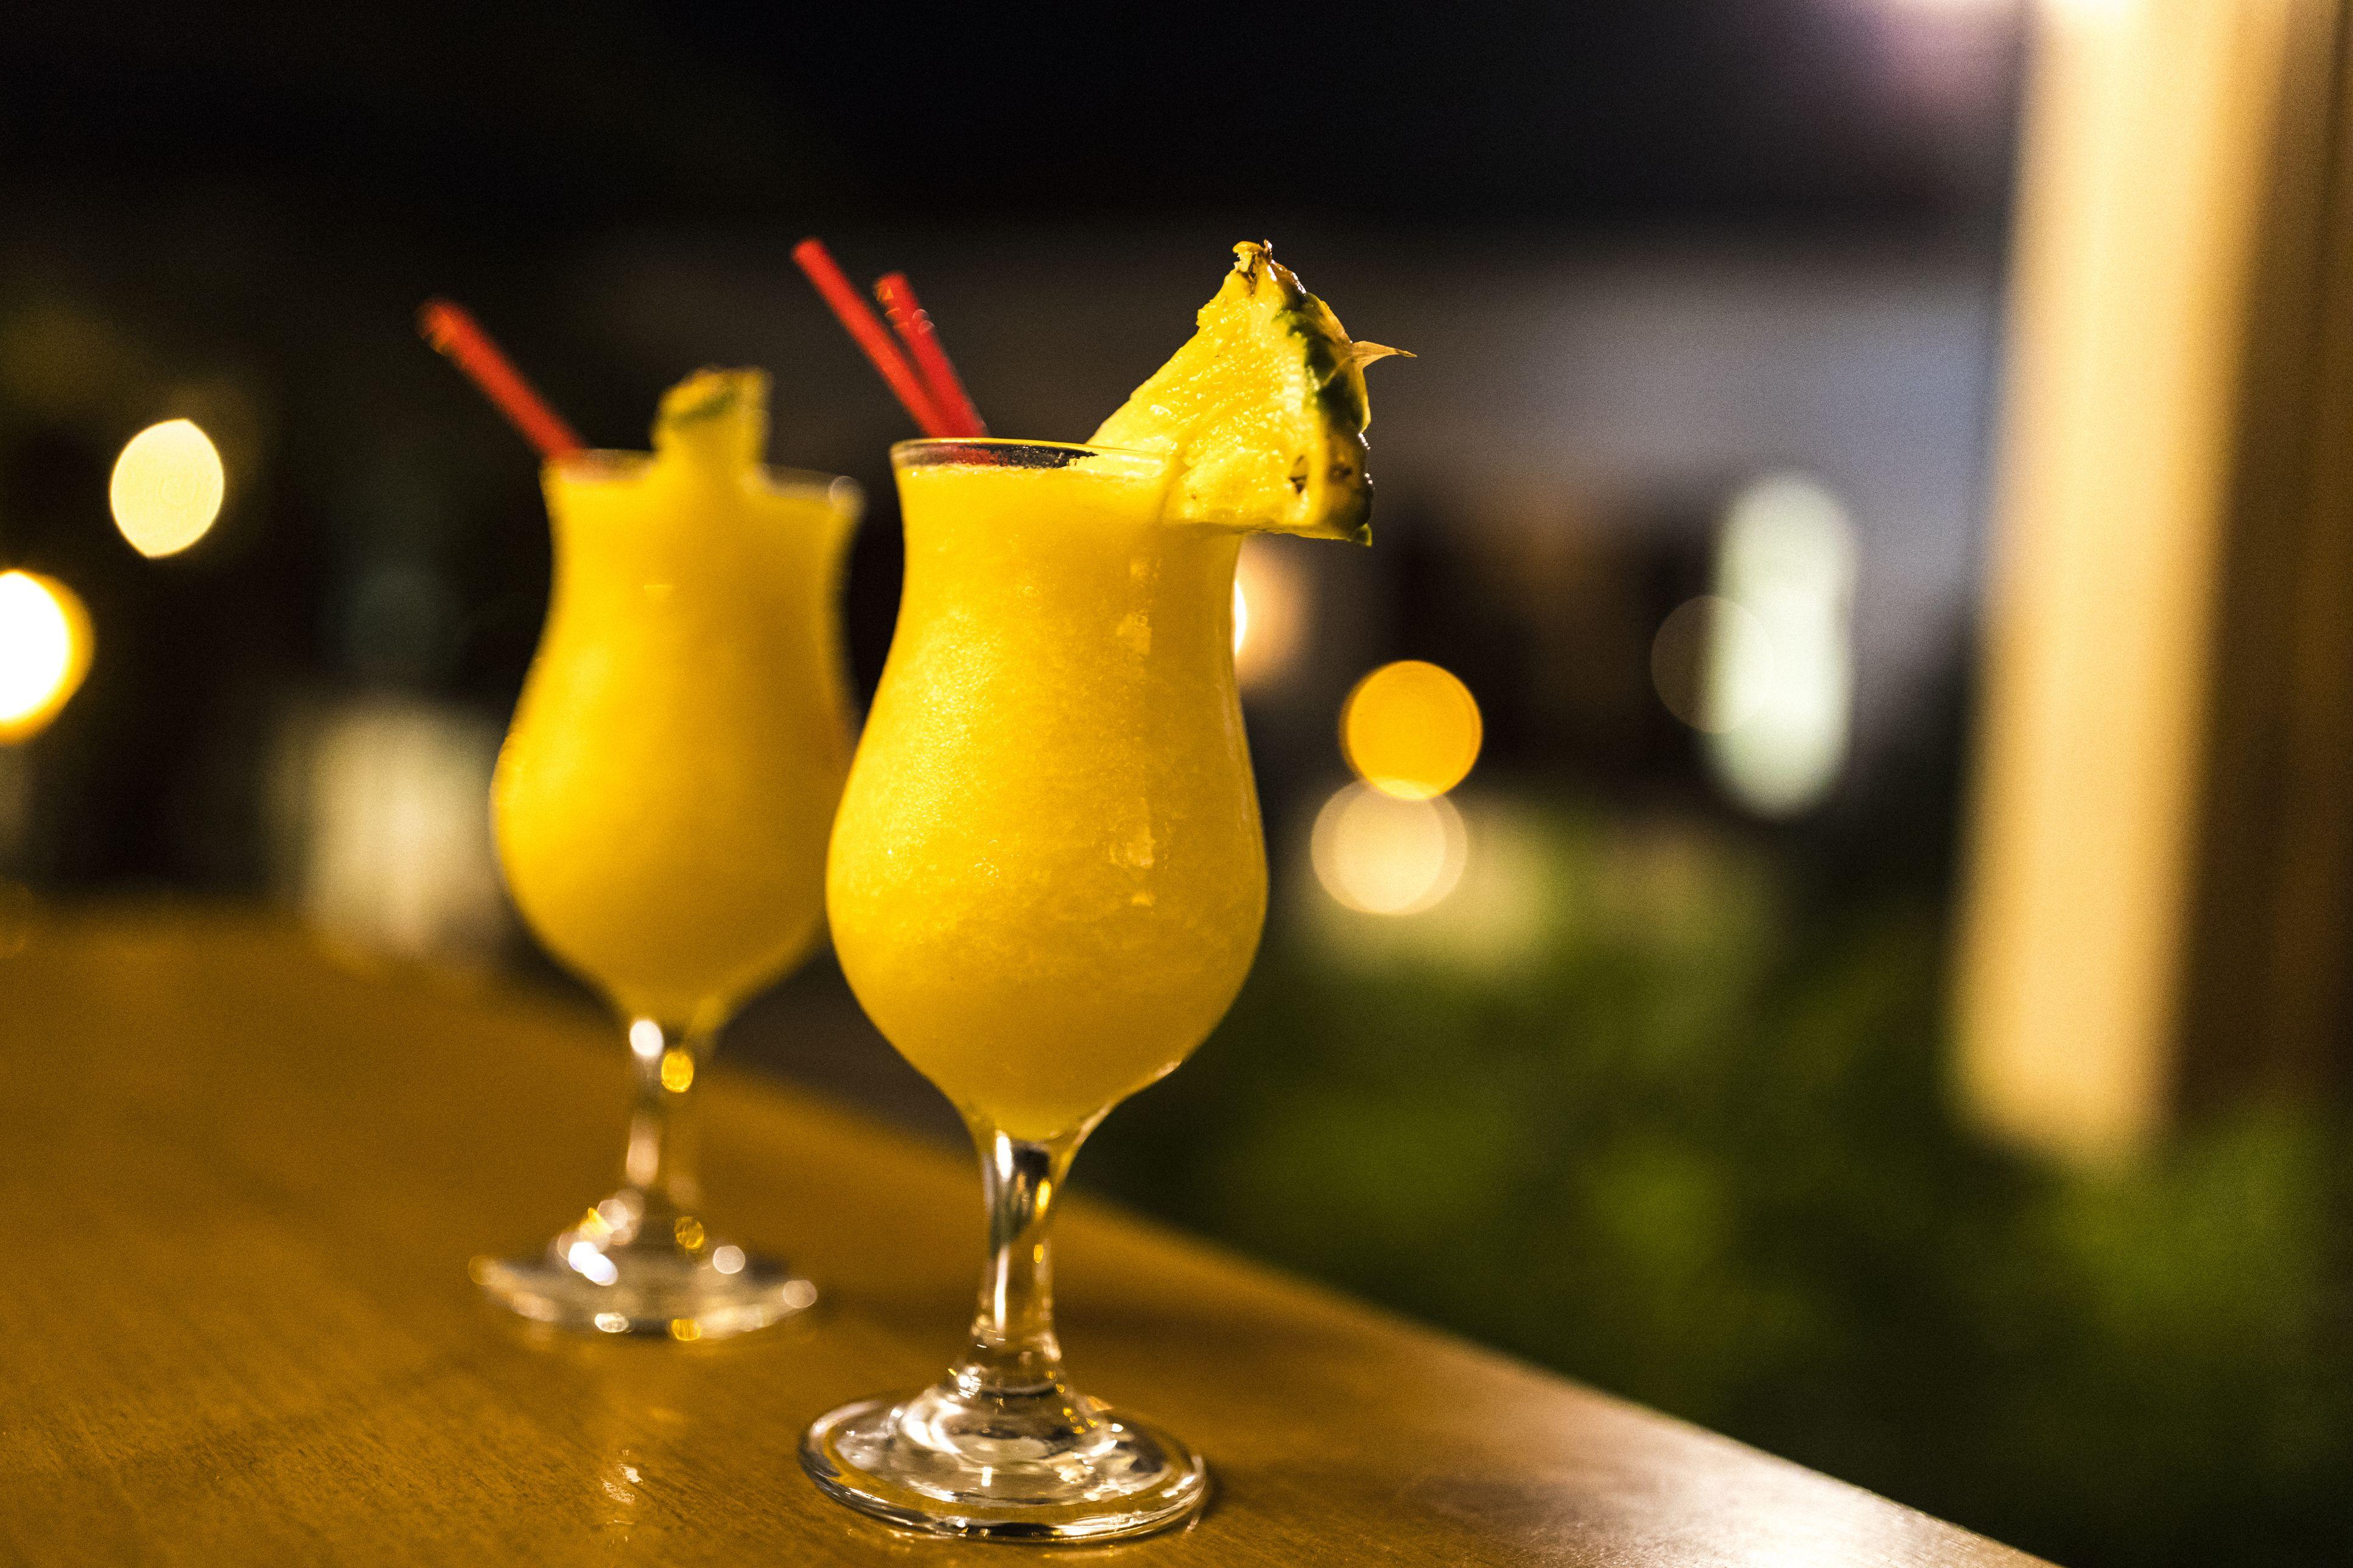 Mango Cocktail a Taste of Paradise